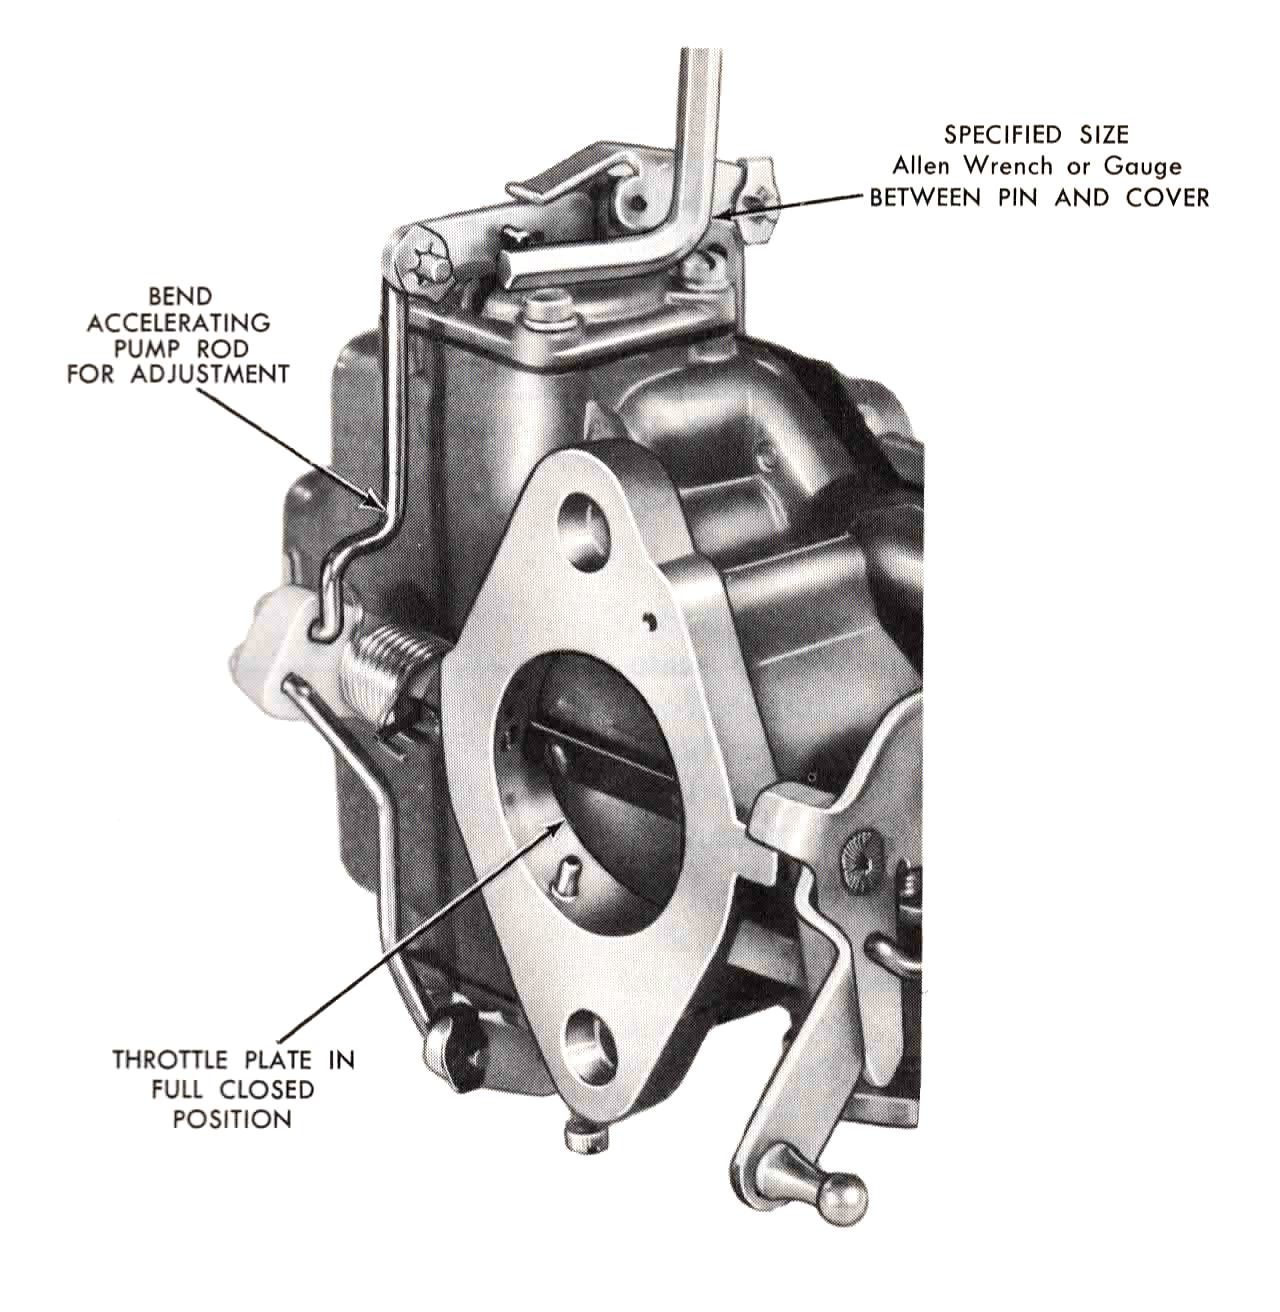 1100 Accelerator Pump